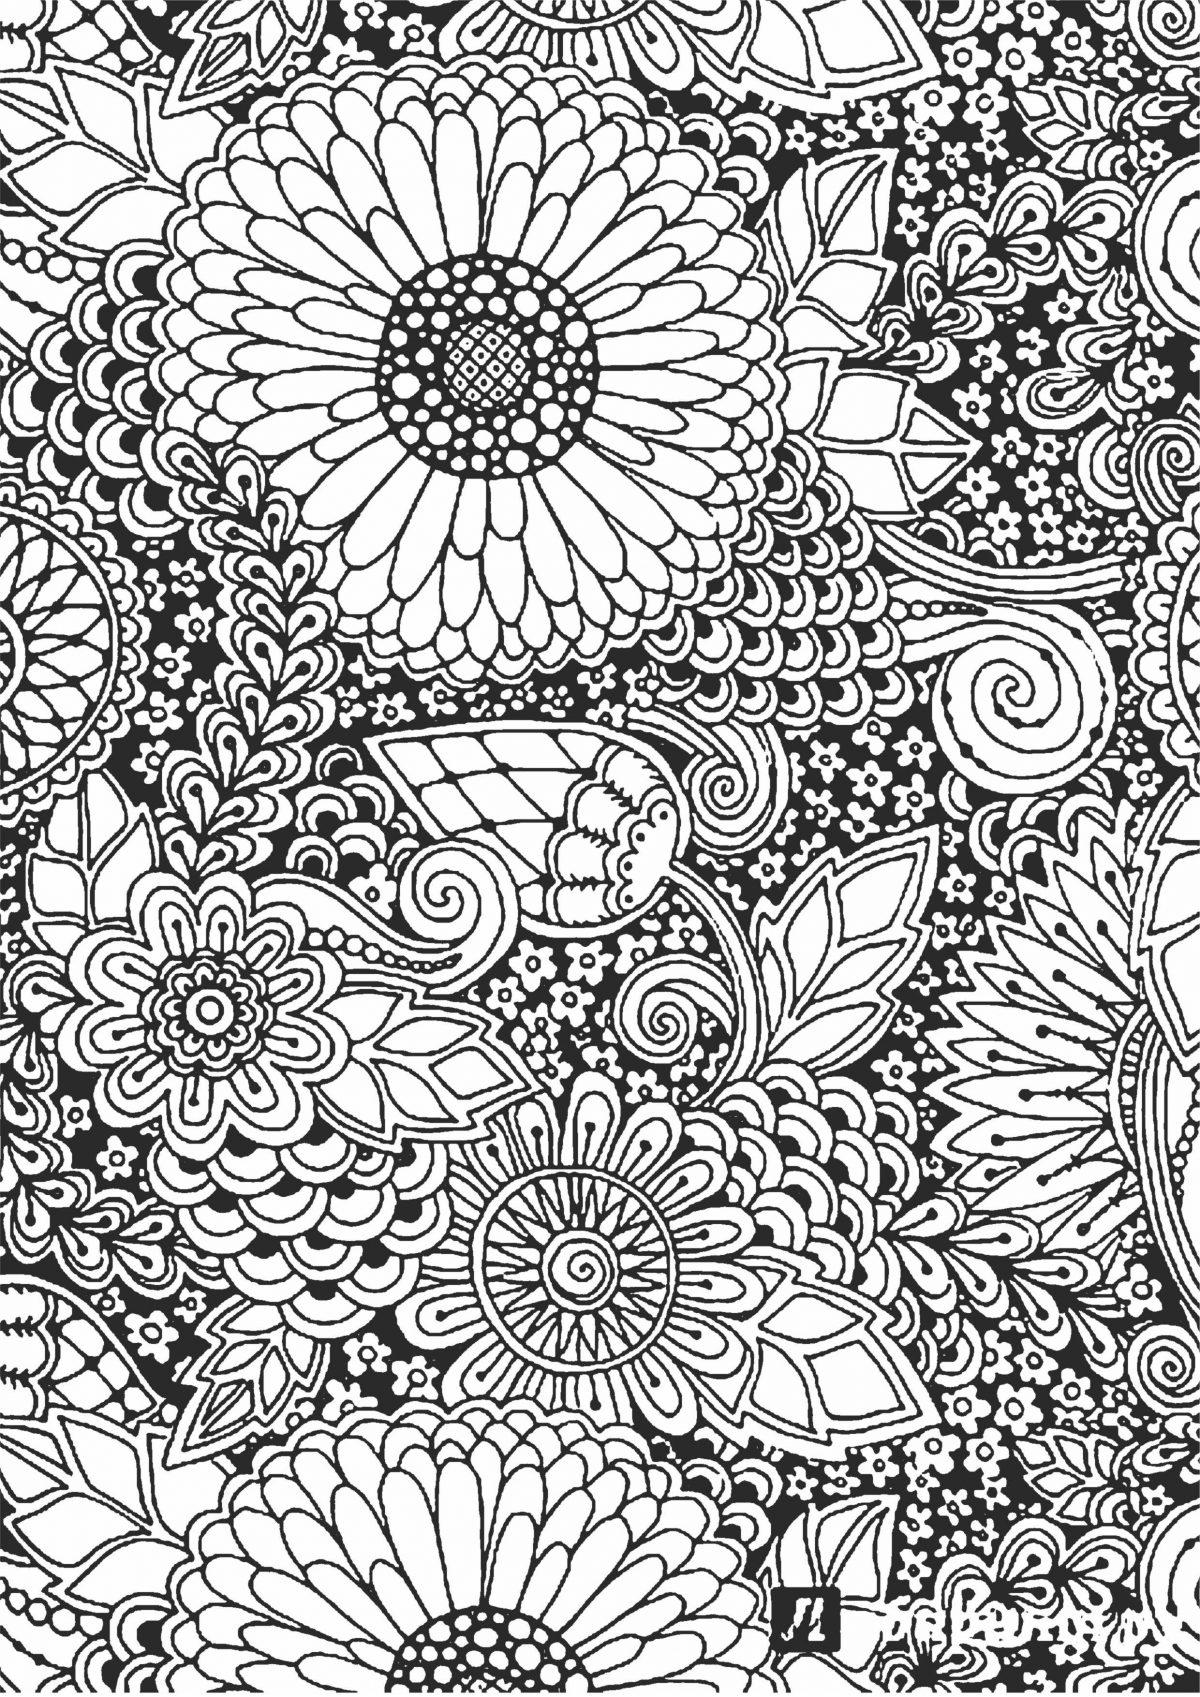 Раскраска с цветами